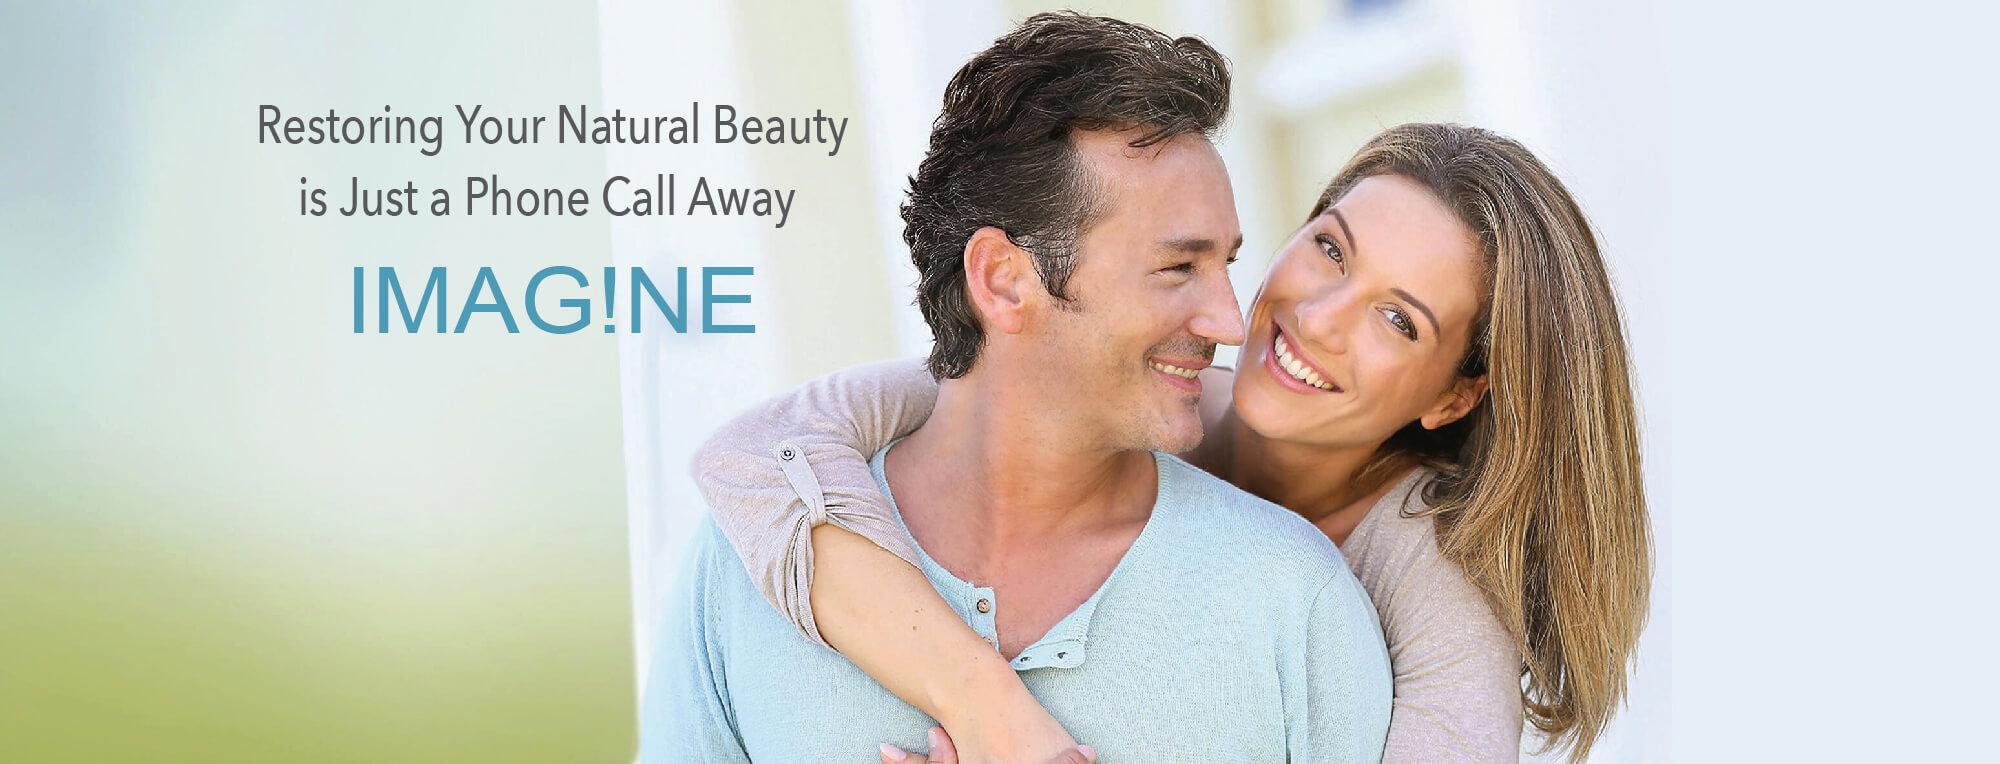 Diepenbrock Facial Cosmetic Plastic Surgery on Dupont Circle Fort Wayne Indiana Header Image